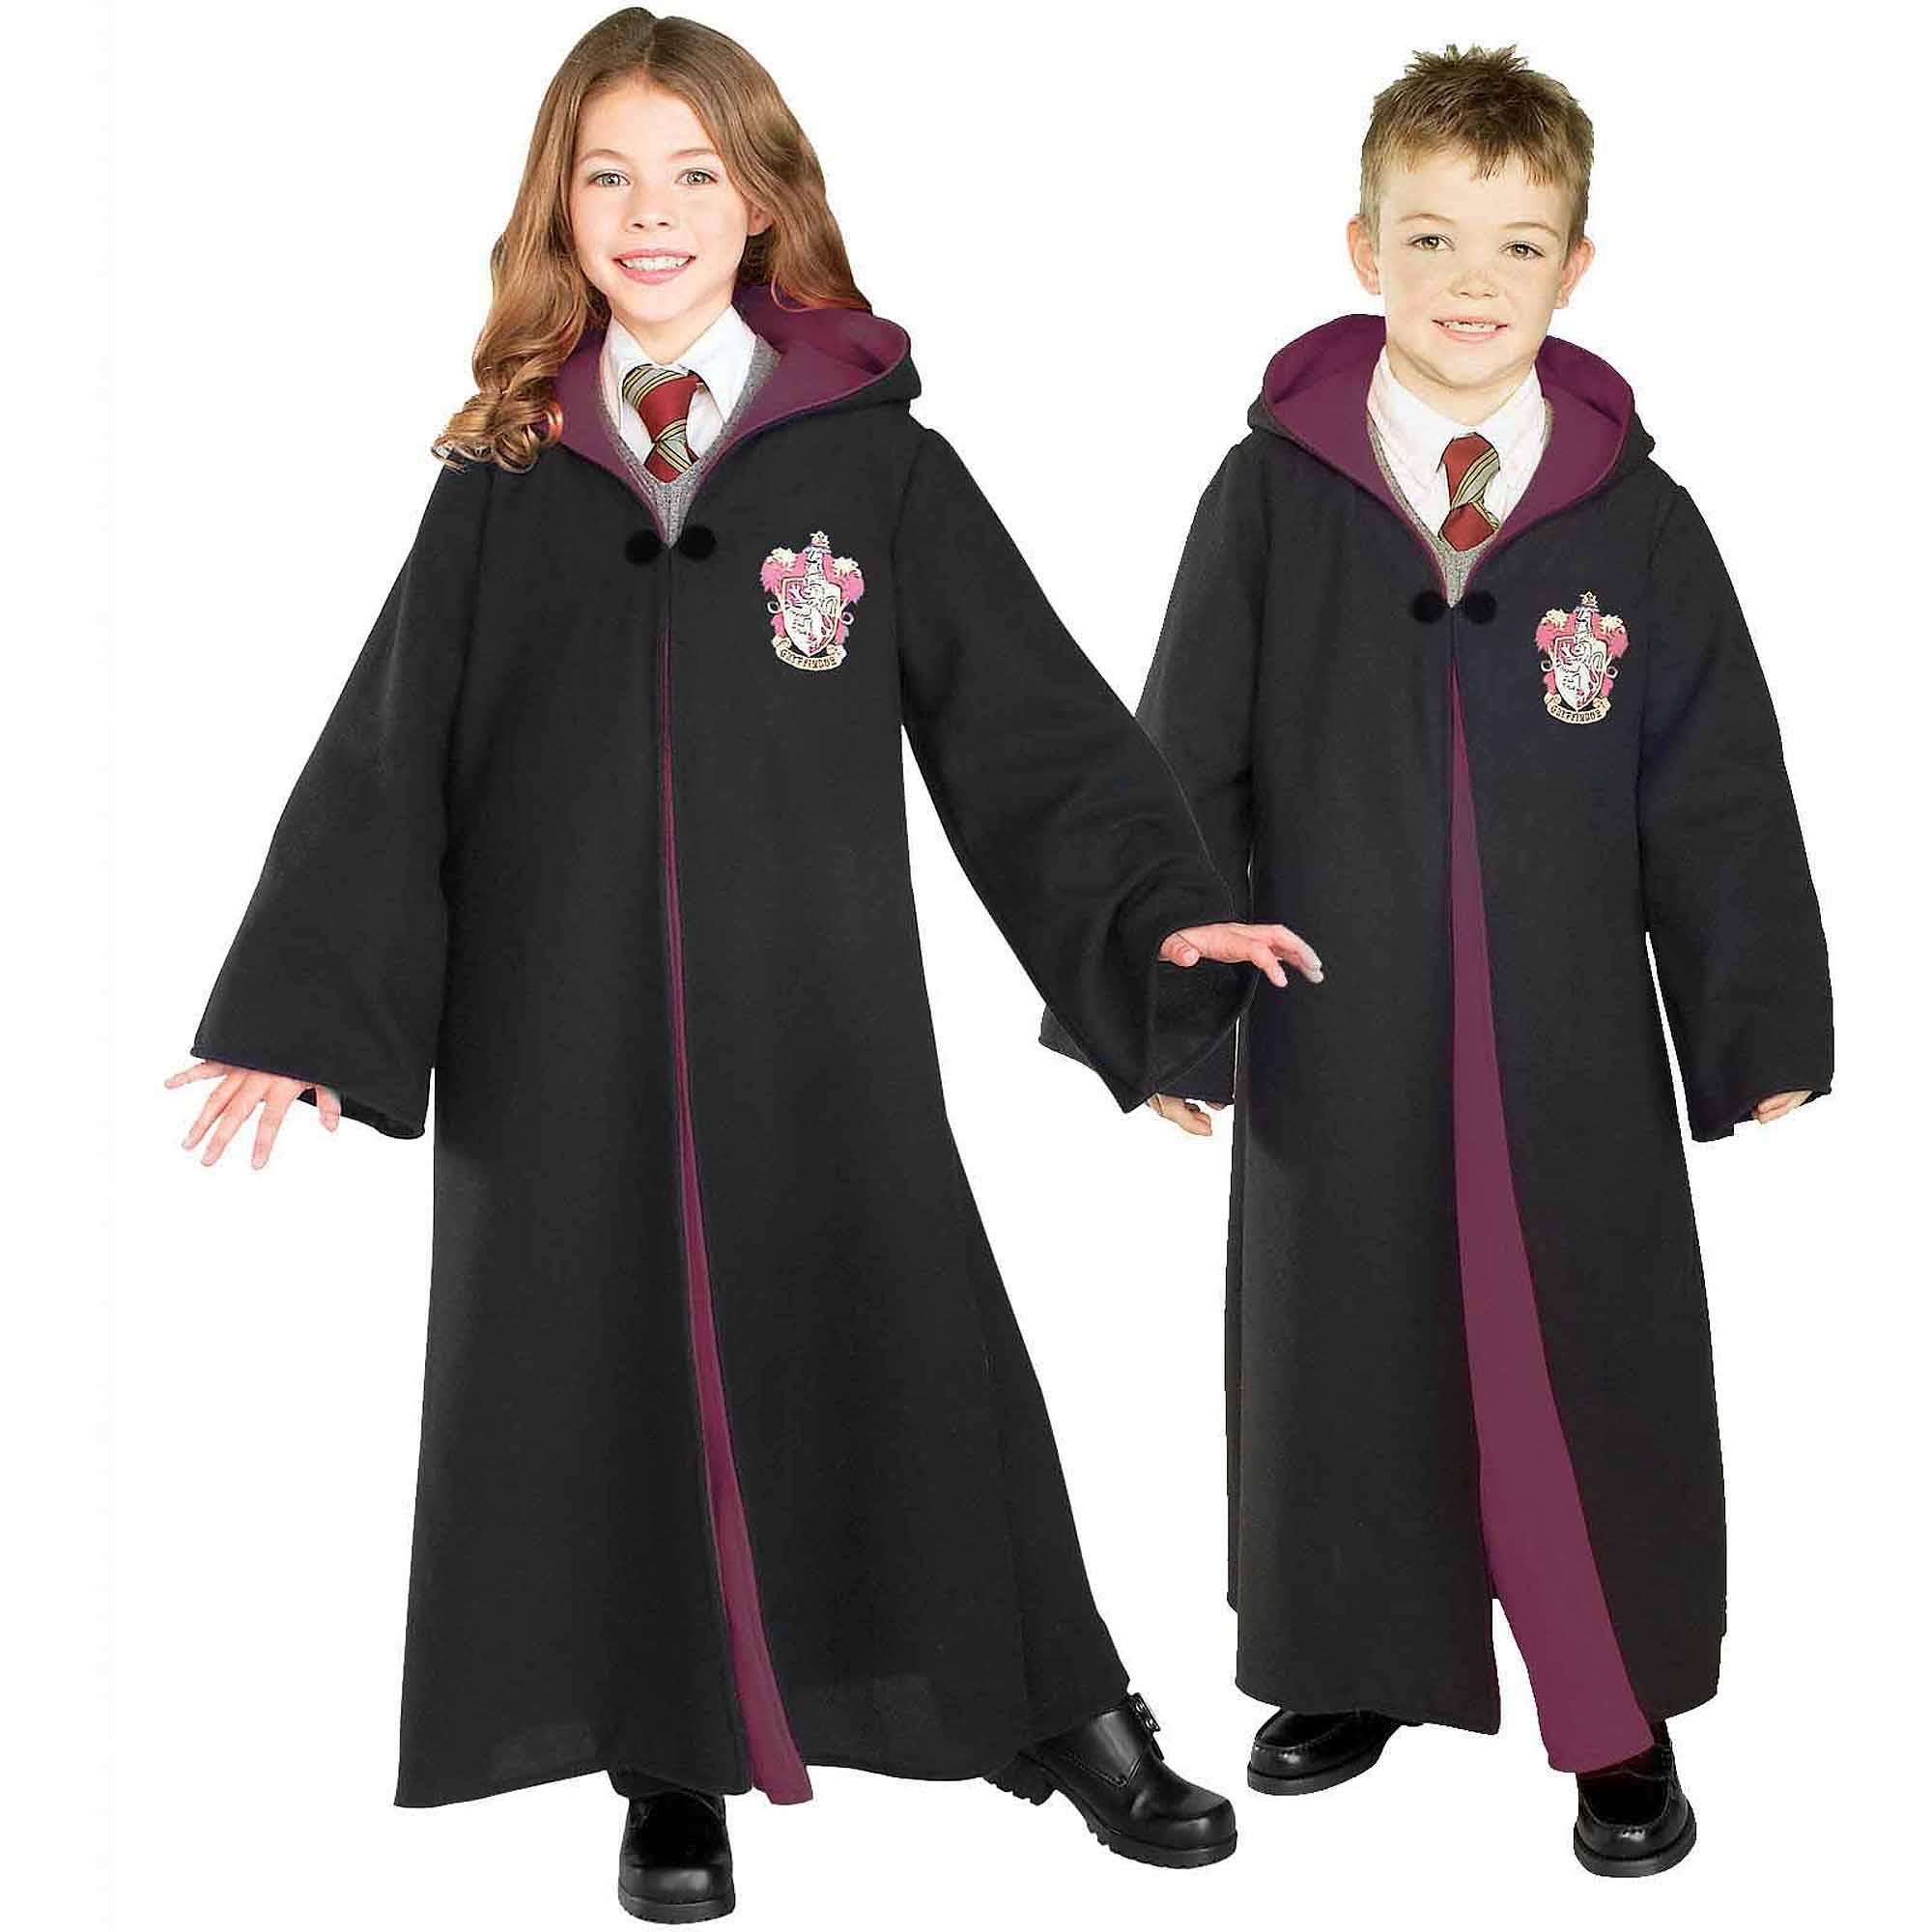 Harry Potter Deluxe Gryffindor Robe Child Halloween Costume